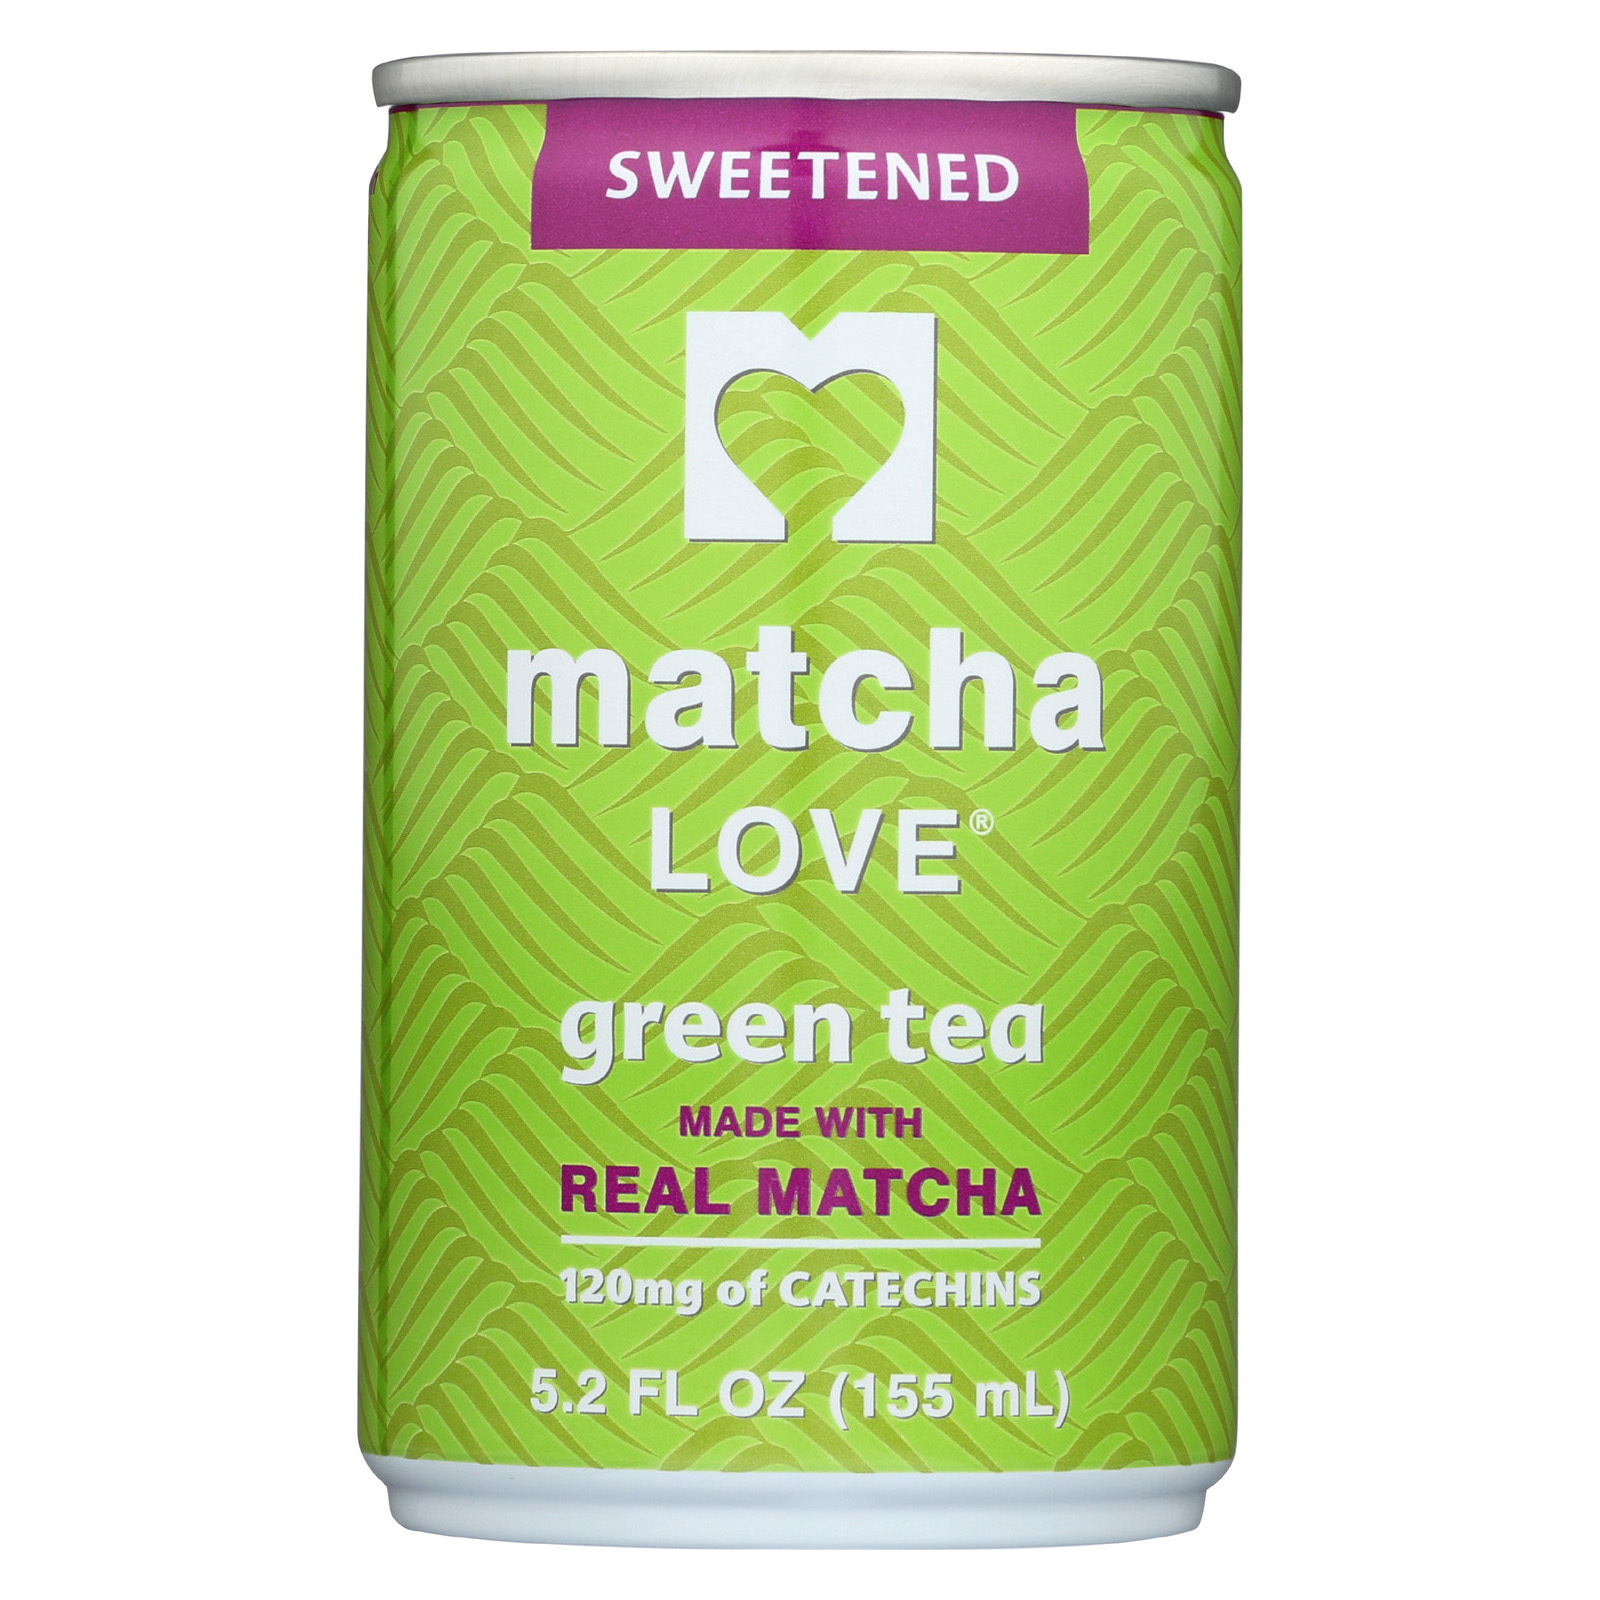 Matcha Love Sweetened Green Tea Powder - Case of 20 - 5.2 oz.